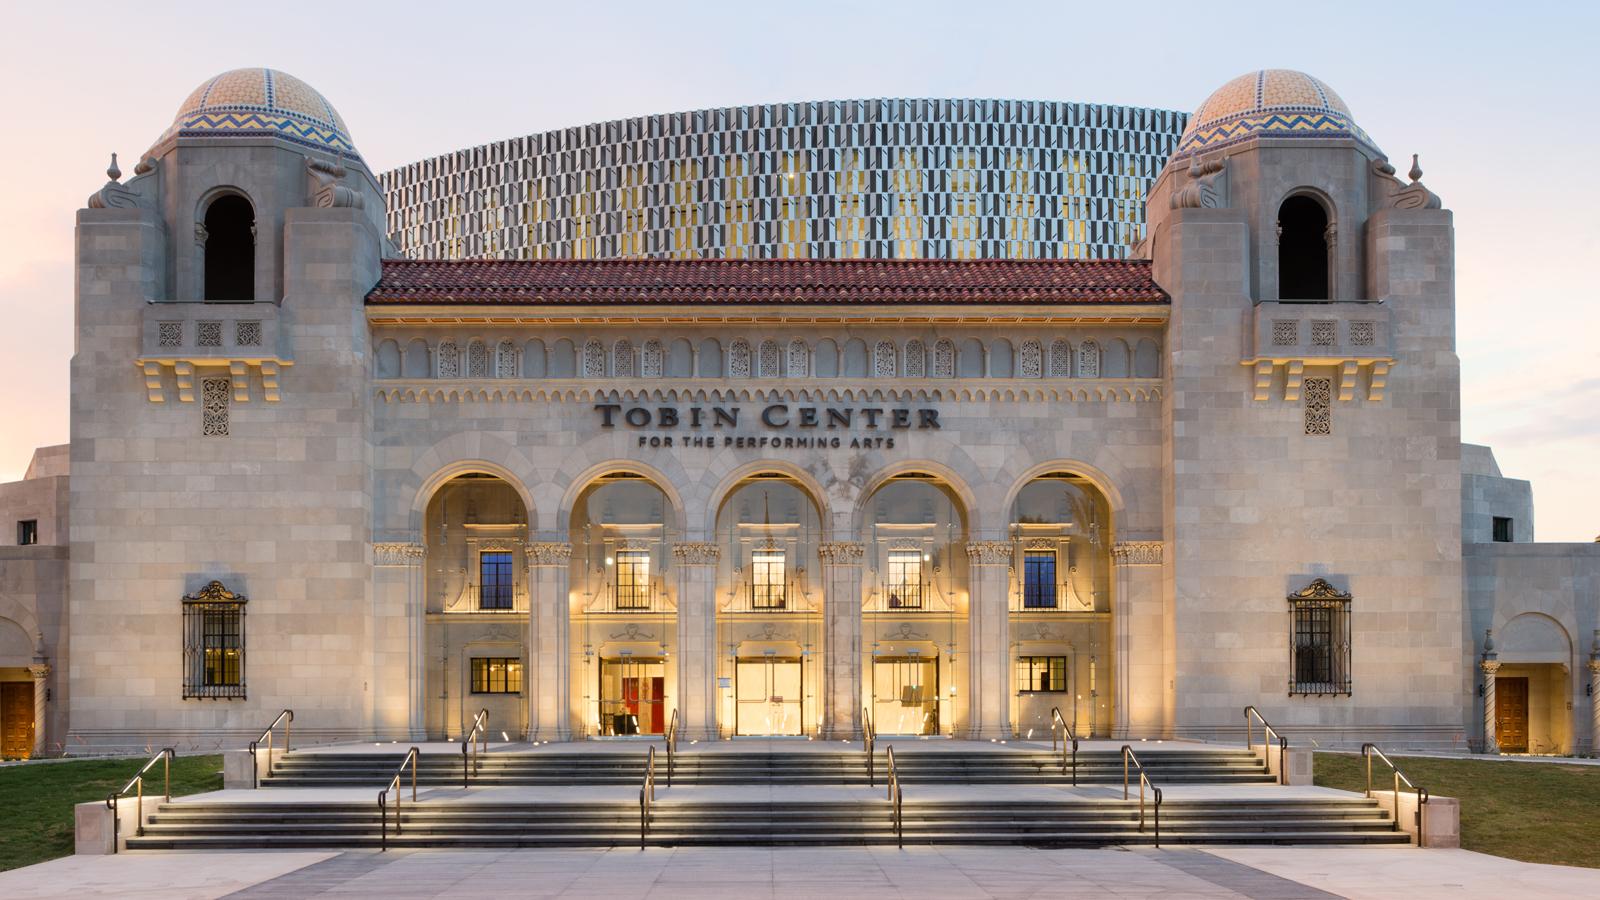 Tobin Center For The Performing Arts, San Antonio TX USA